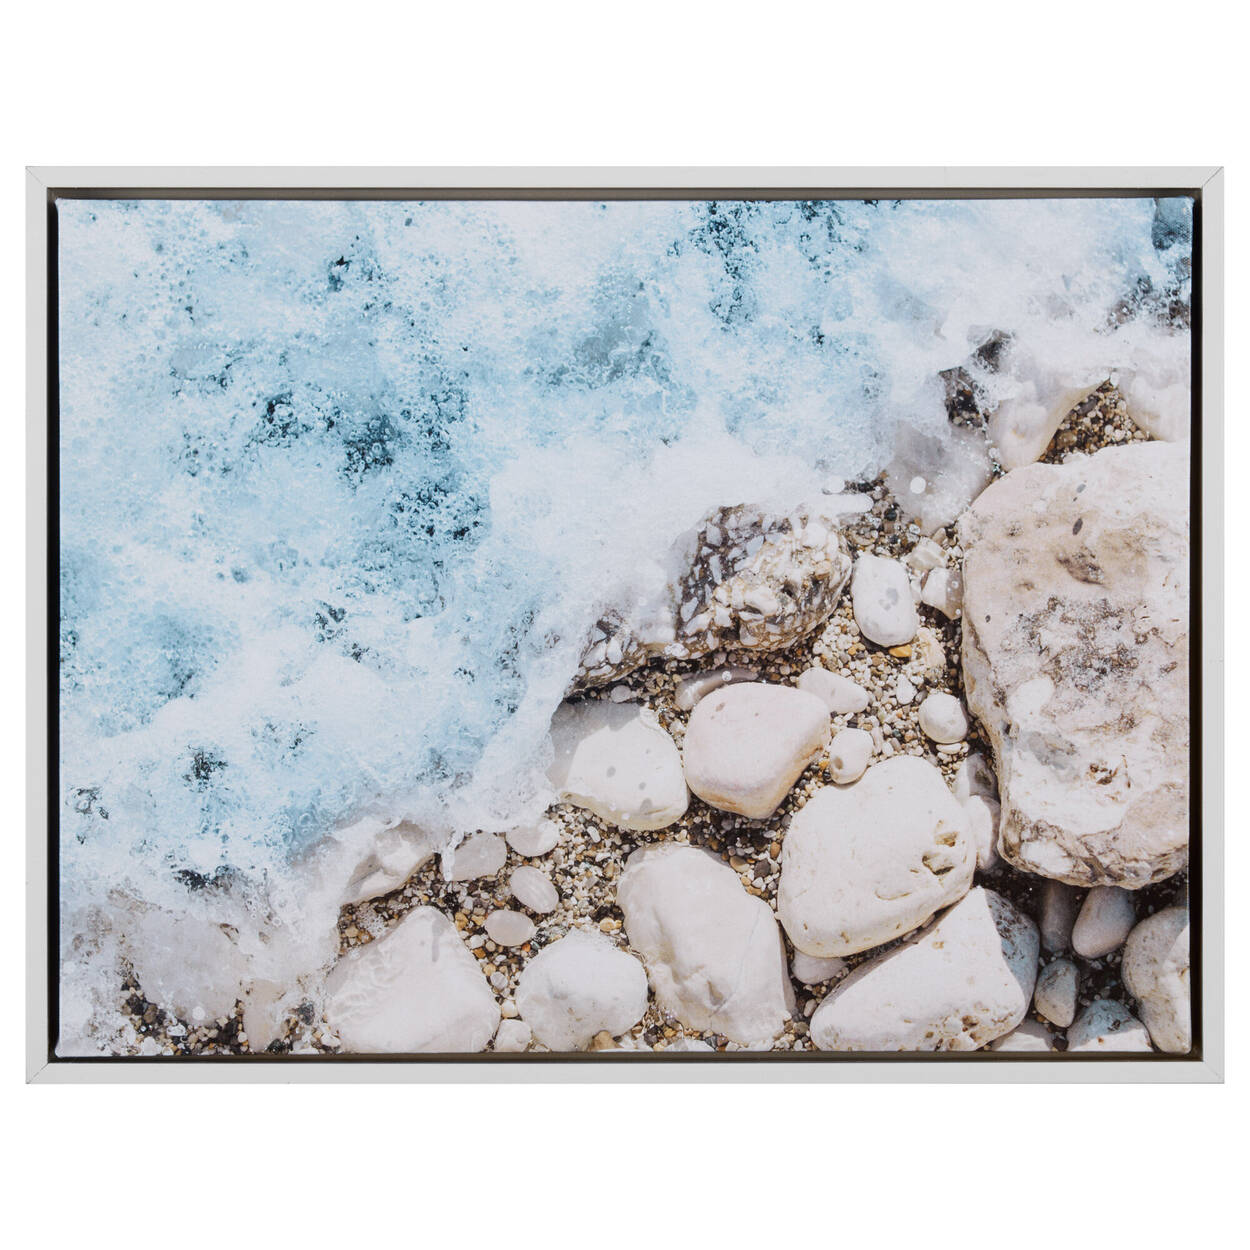 Summer Waves Printed Framed Art